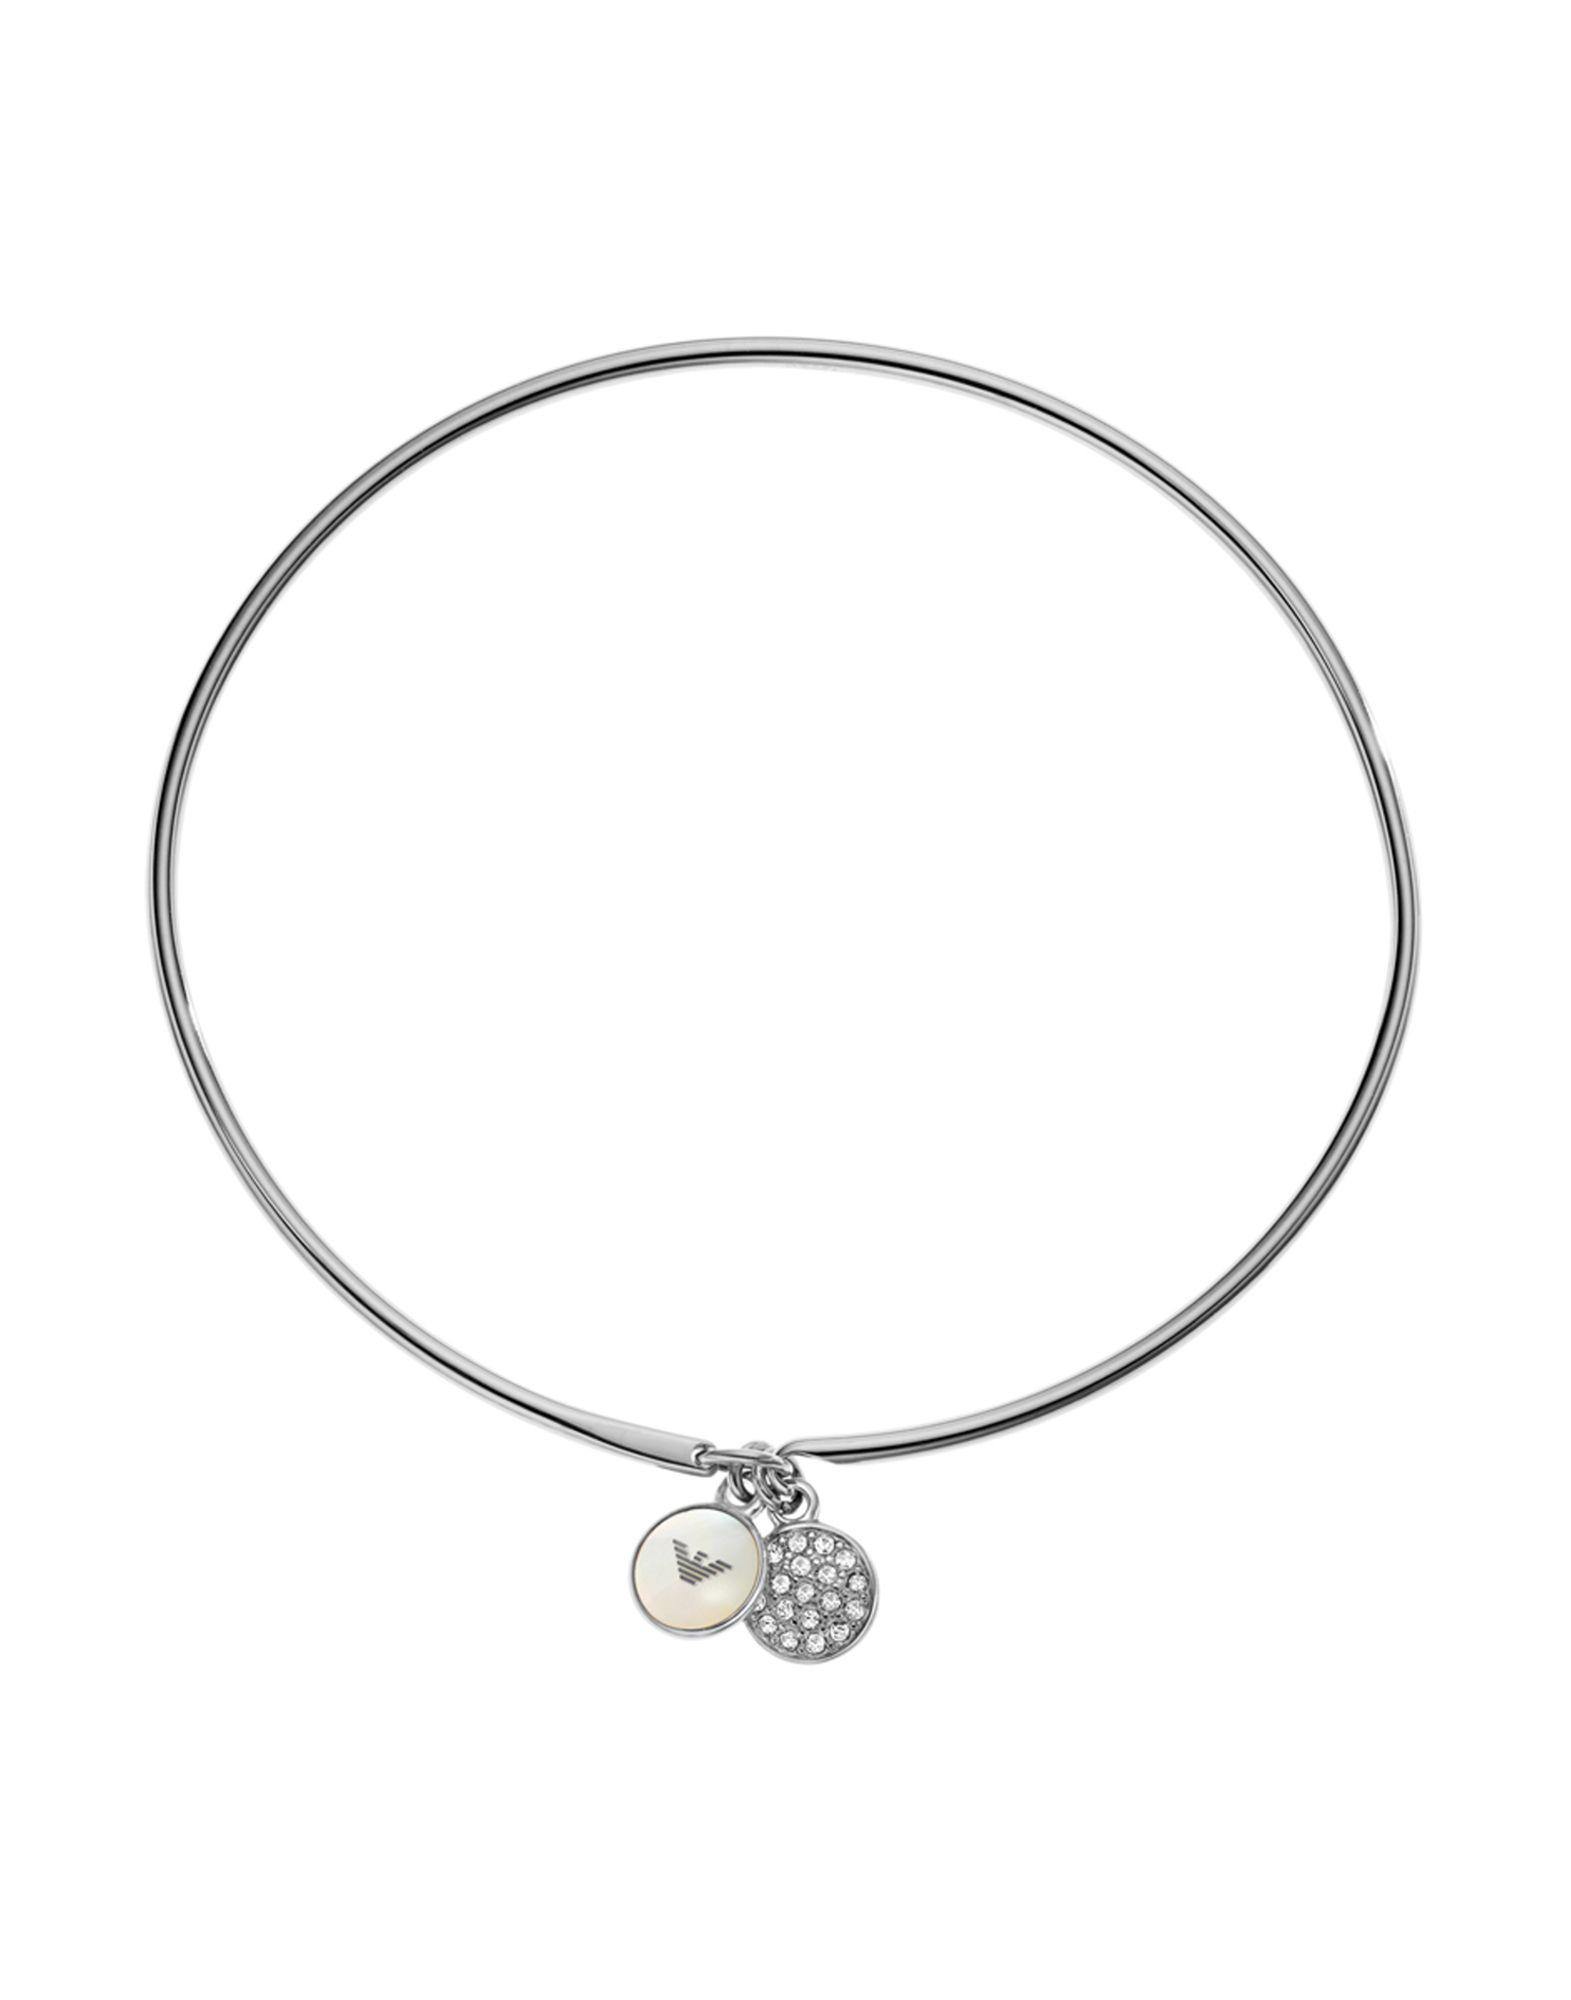 Emporio Armani Women's Bracelet EGS2348710 GnRxMmp8K